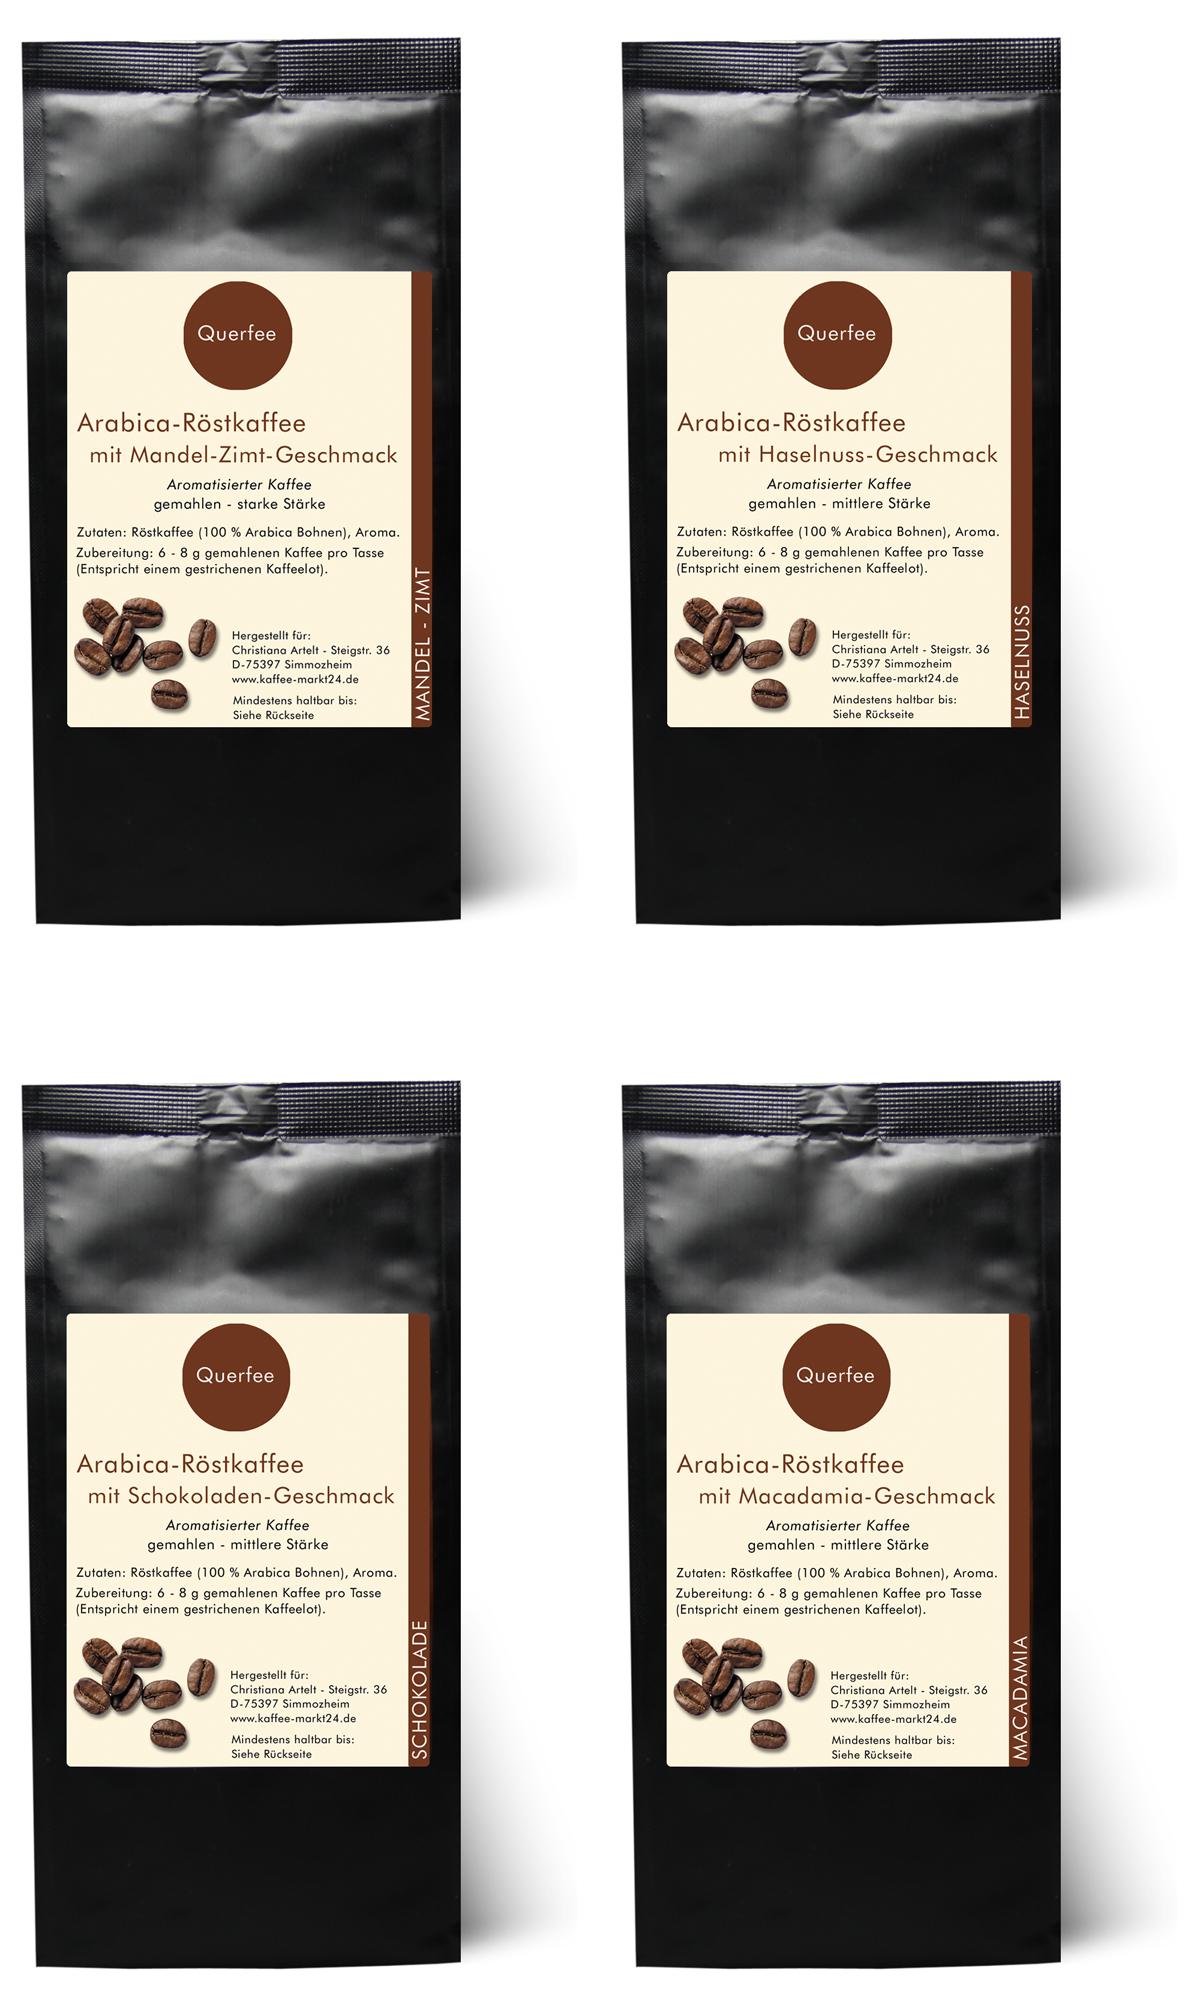 4 x Kaffee mit Geschmack Probierset - Mandel Zimt, Haselnuss, Schokolade, Macadamia - gemahlen - 4 x 75 g